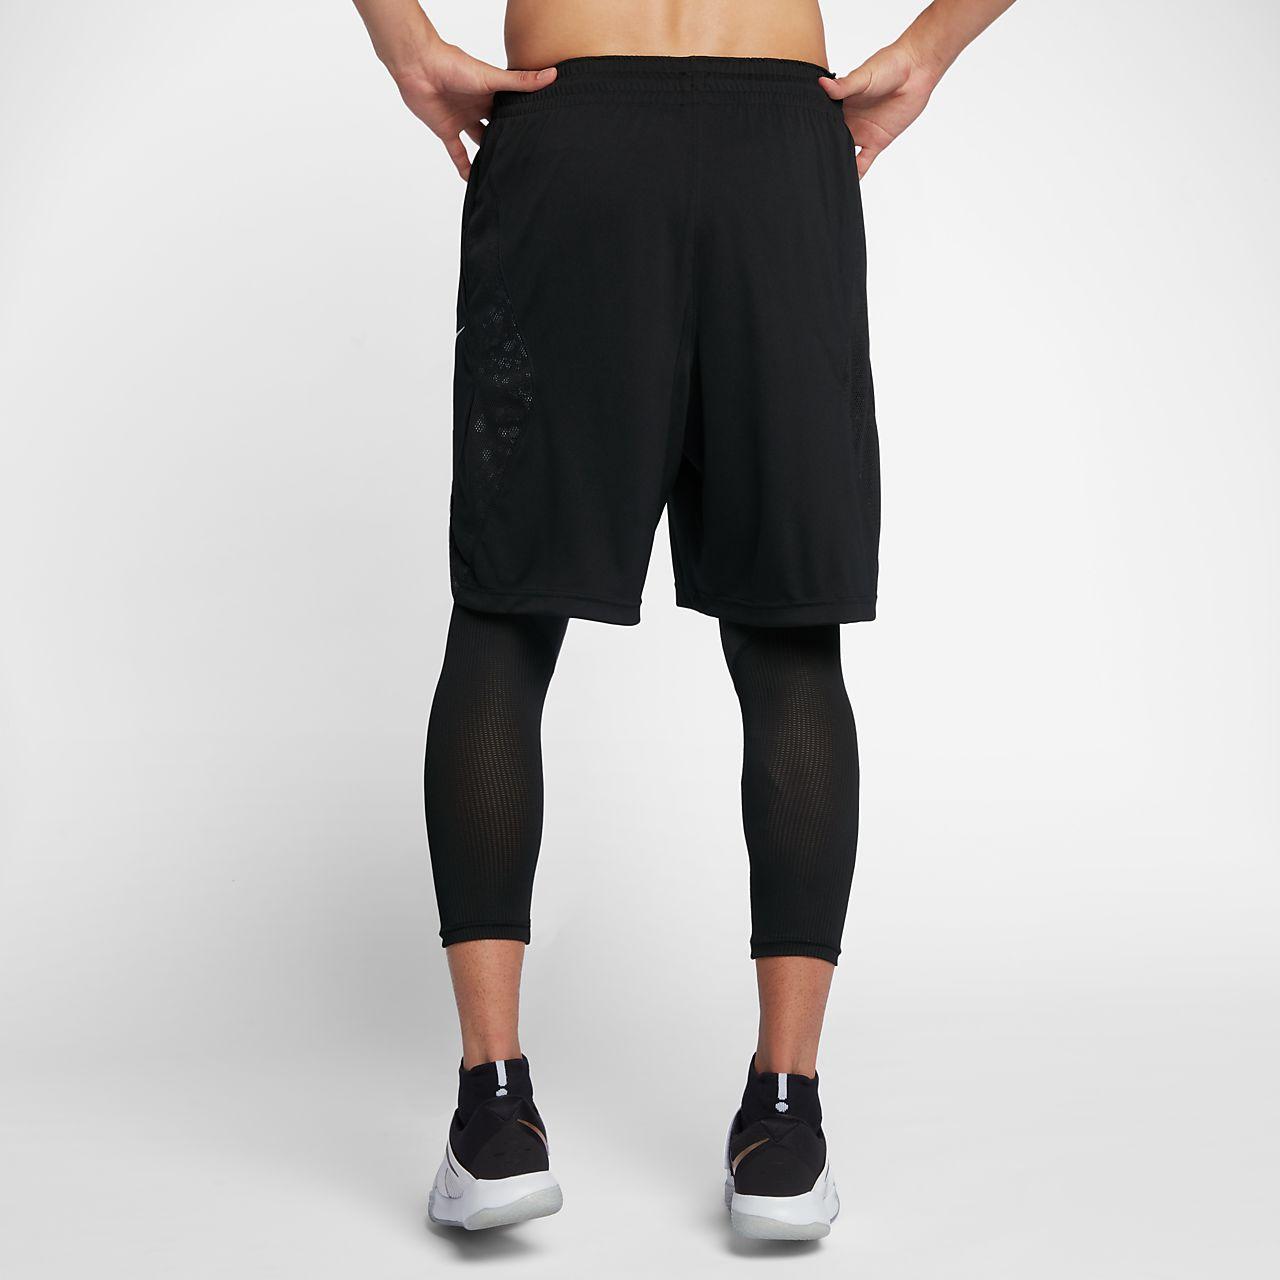 Basketball Shorts Nike Dry Men's 9\